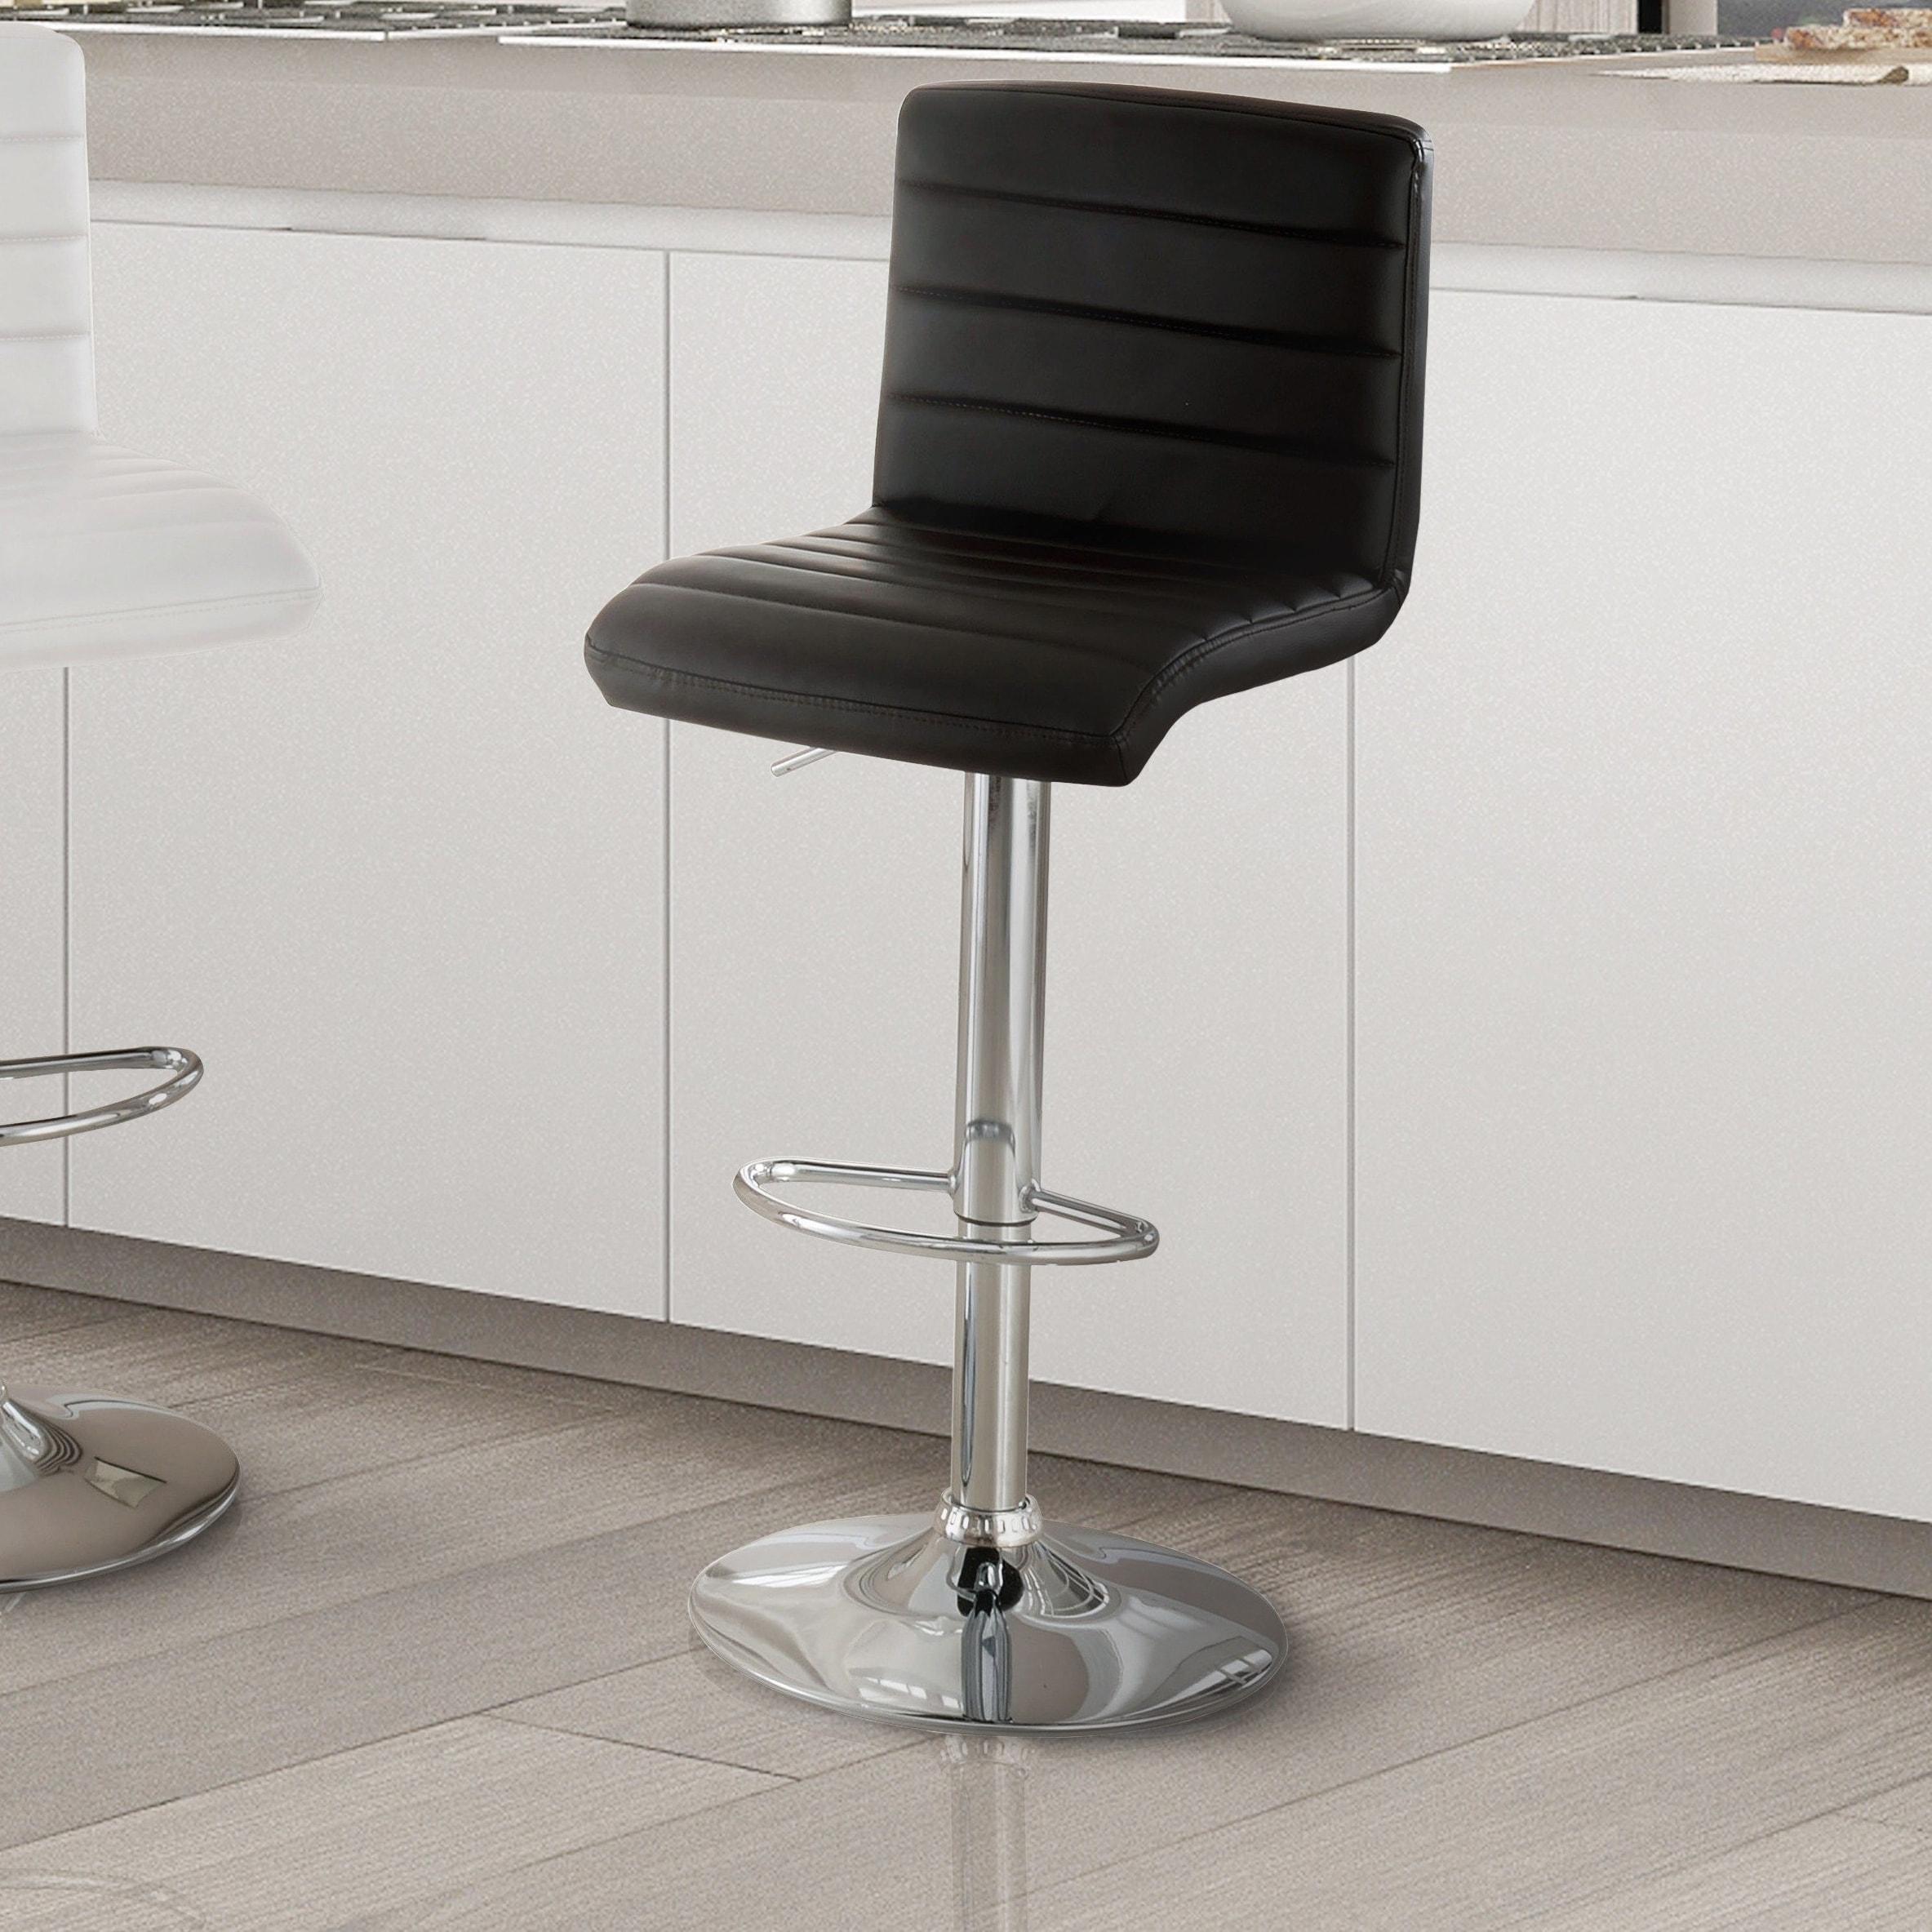 Awe Inspiring Winzzy Modern Adjustable Height Hydraulic Bar Stool By Foa Machost Co Dining Chair Design Ideas Machostcouk